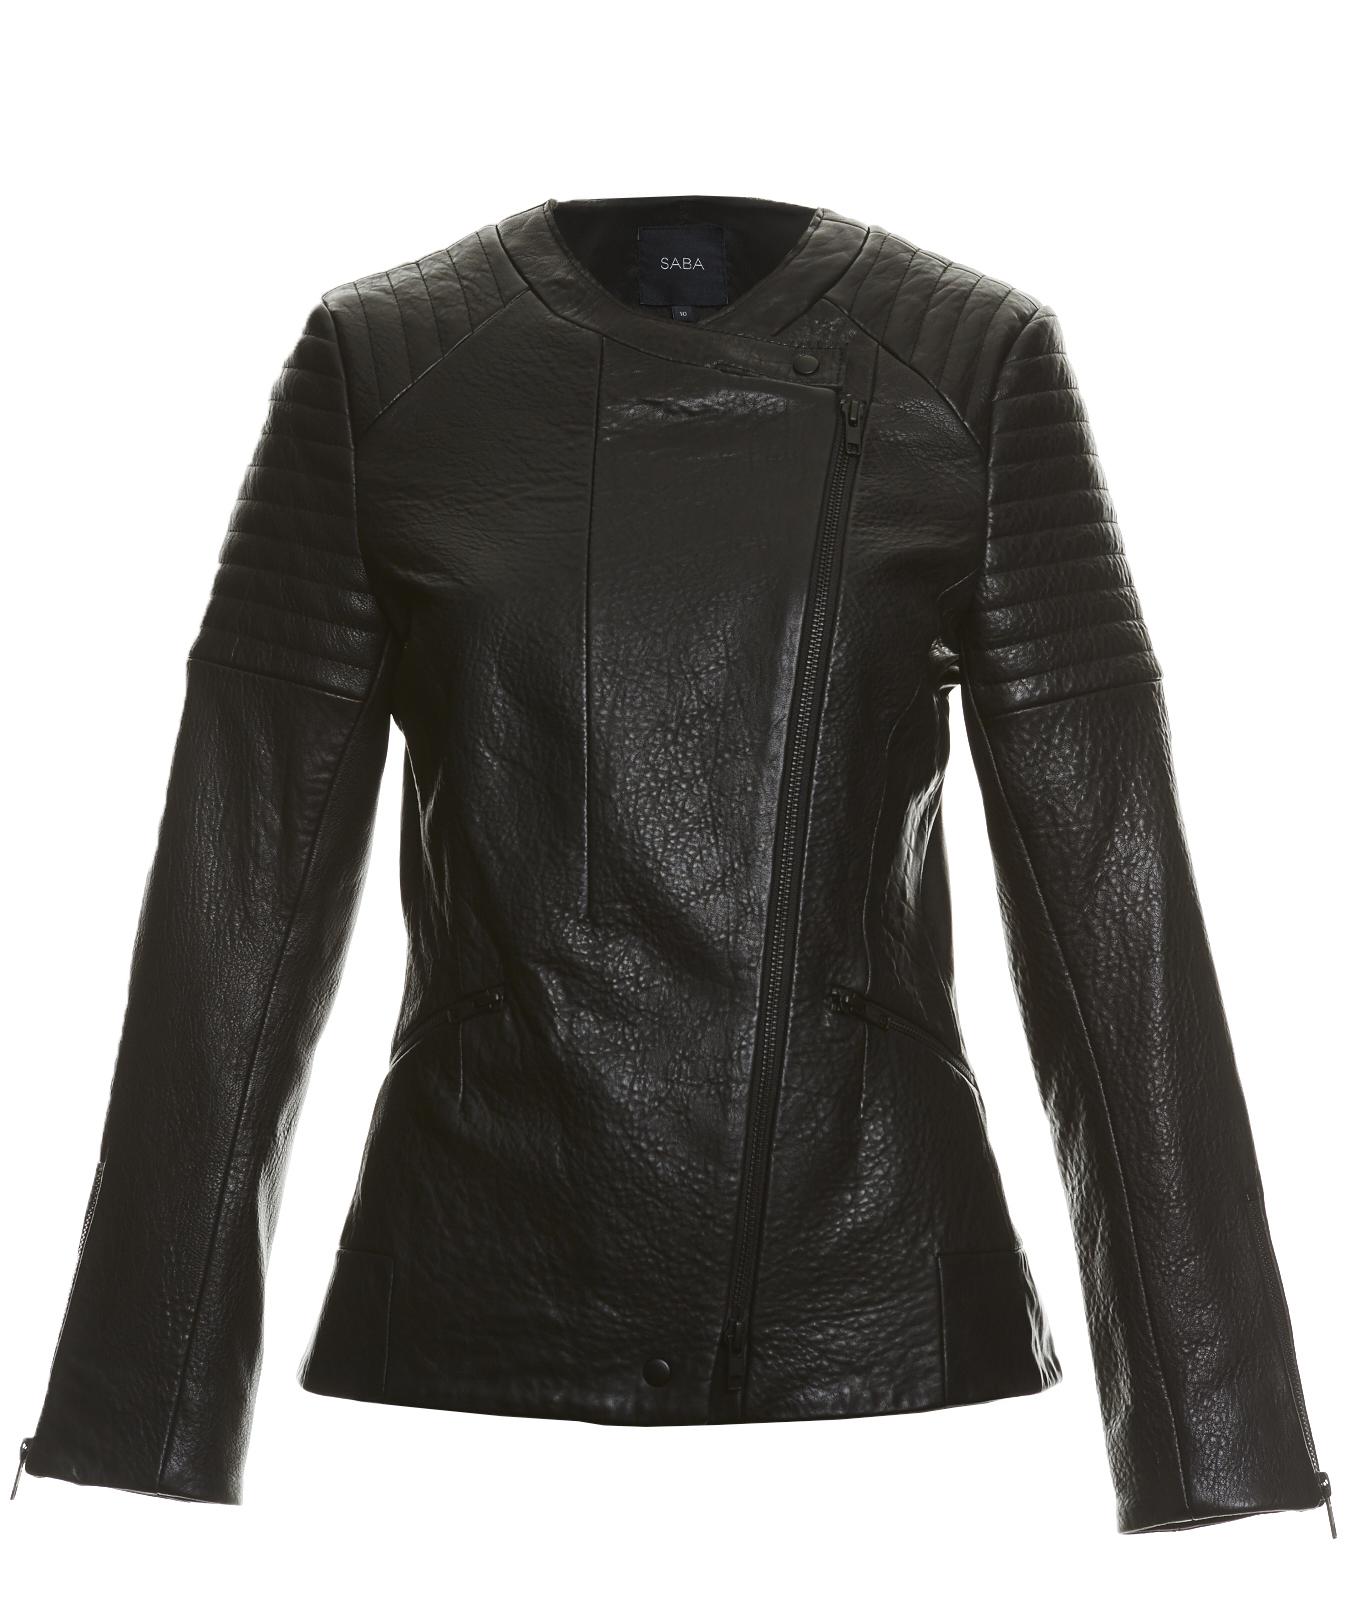 Leather jacket jeanswest -  Leather Biker Saba Erika Biker Jacket Black